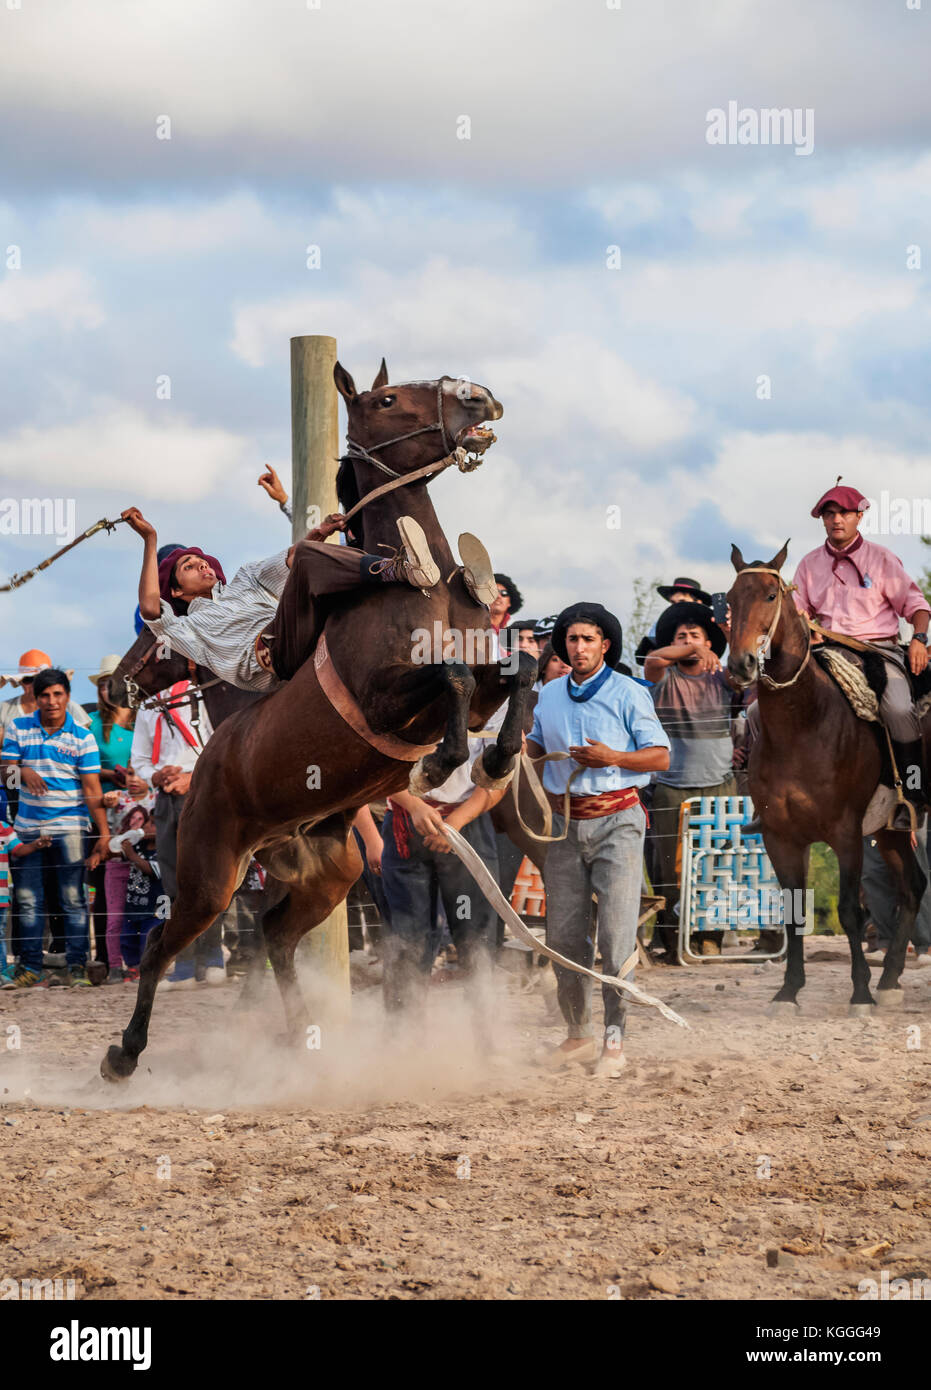 Jineteada Gaucha, traditional sport, Vallecito, San Juan Province, Argentina - Stock Image